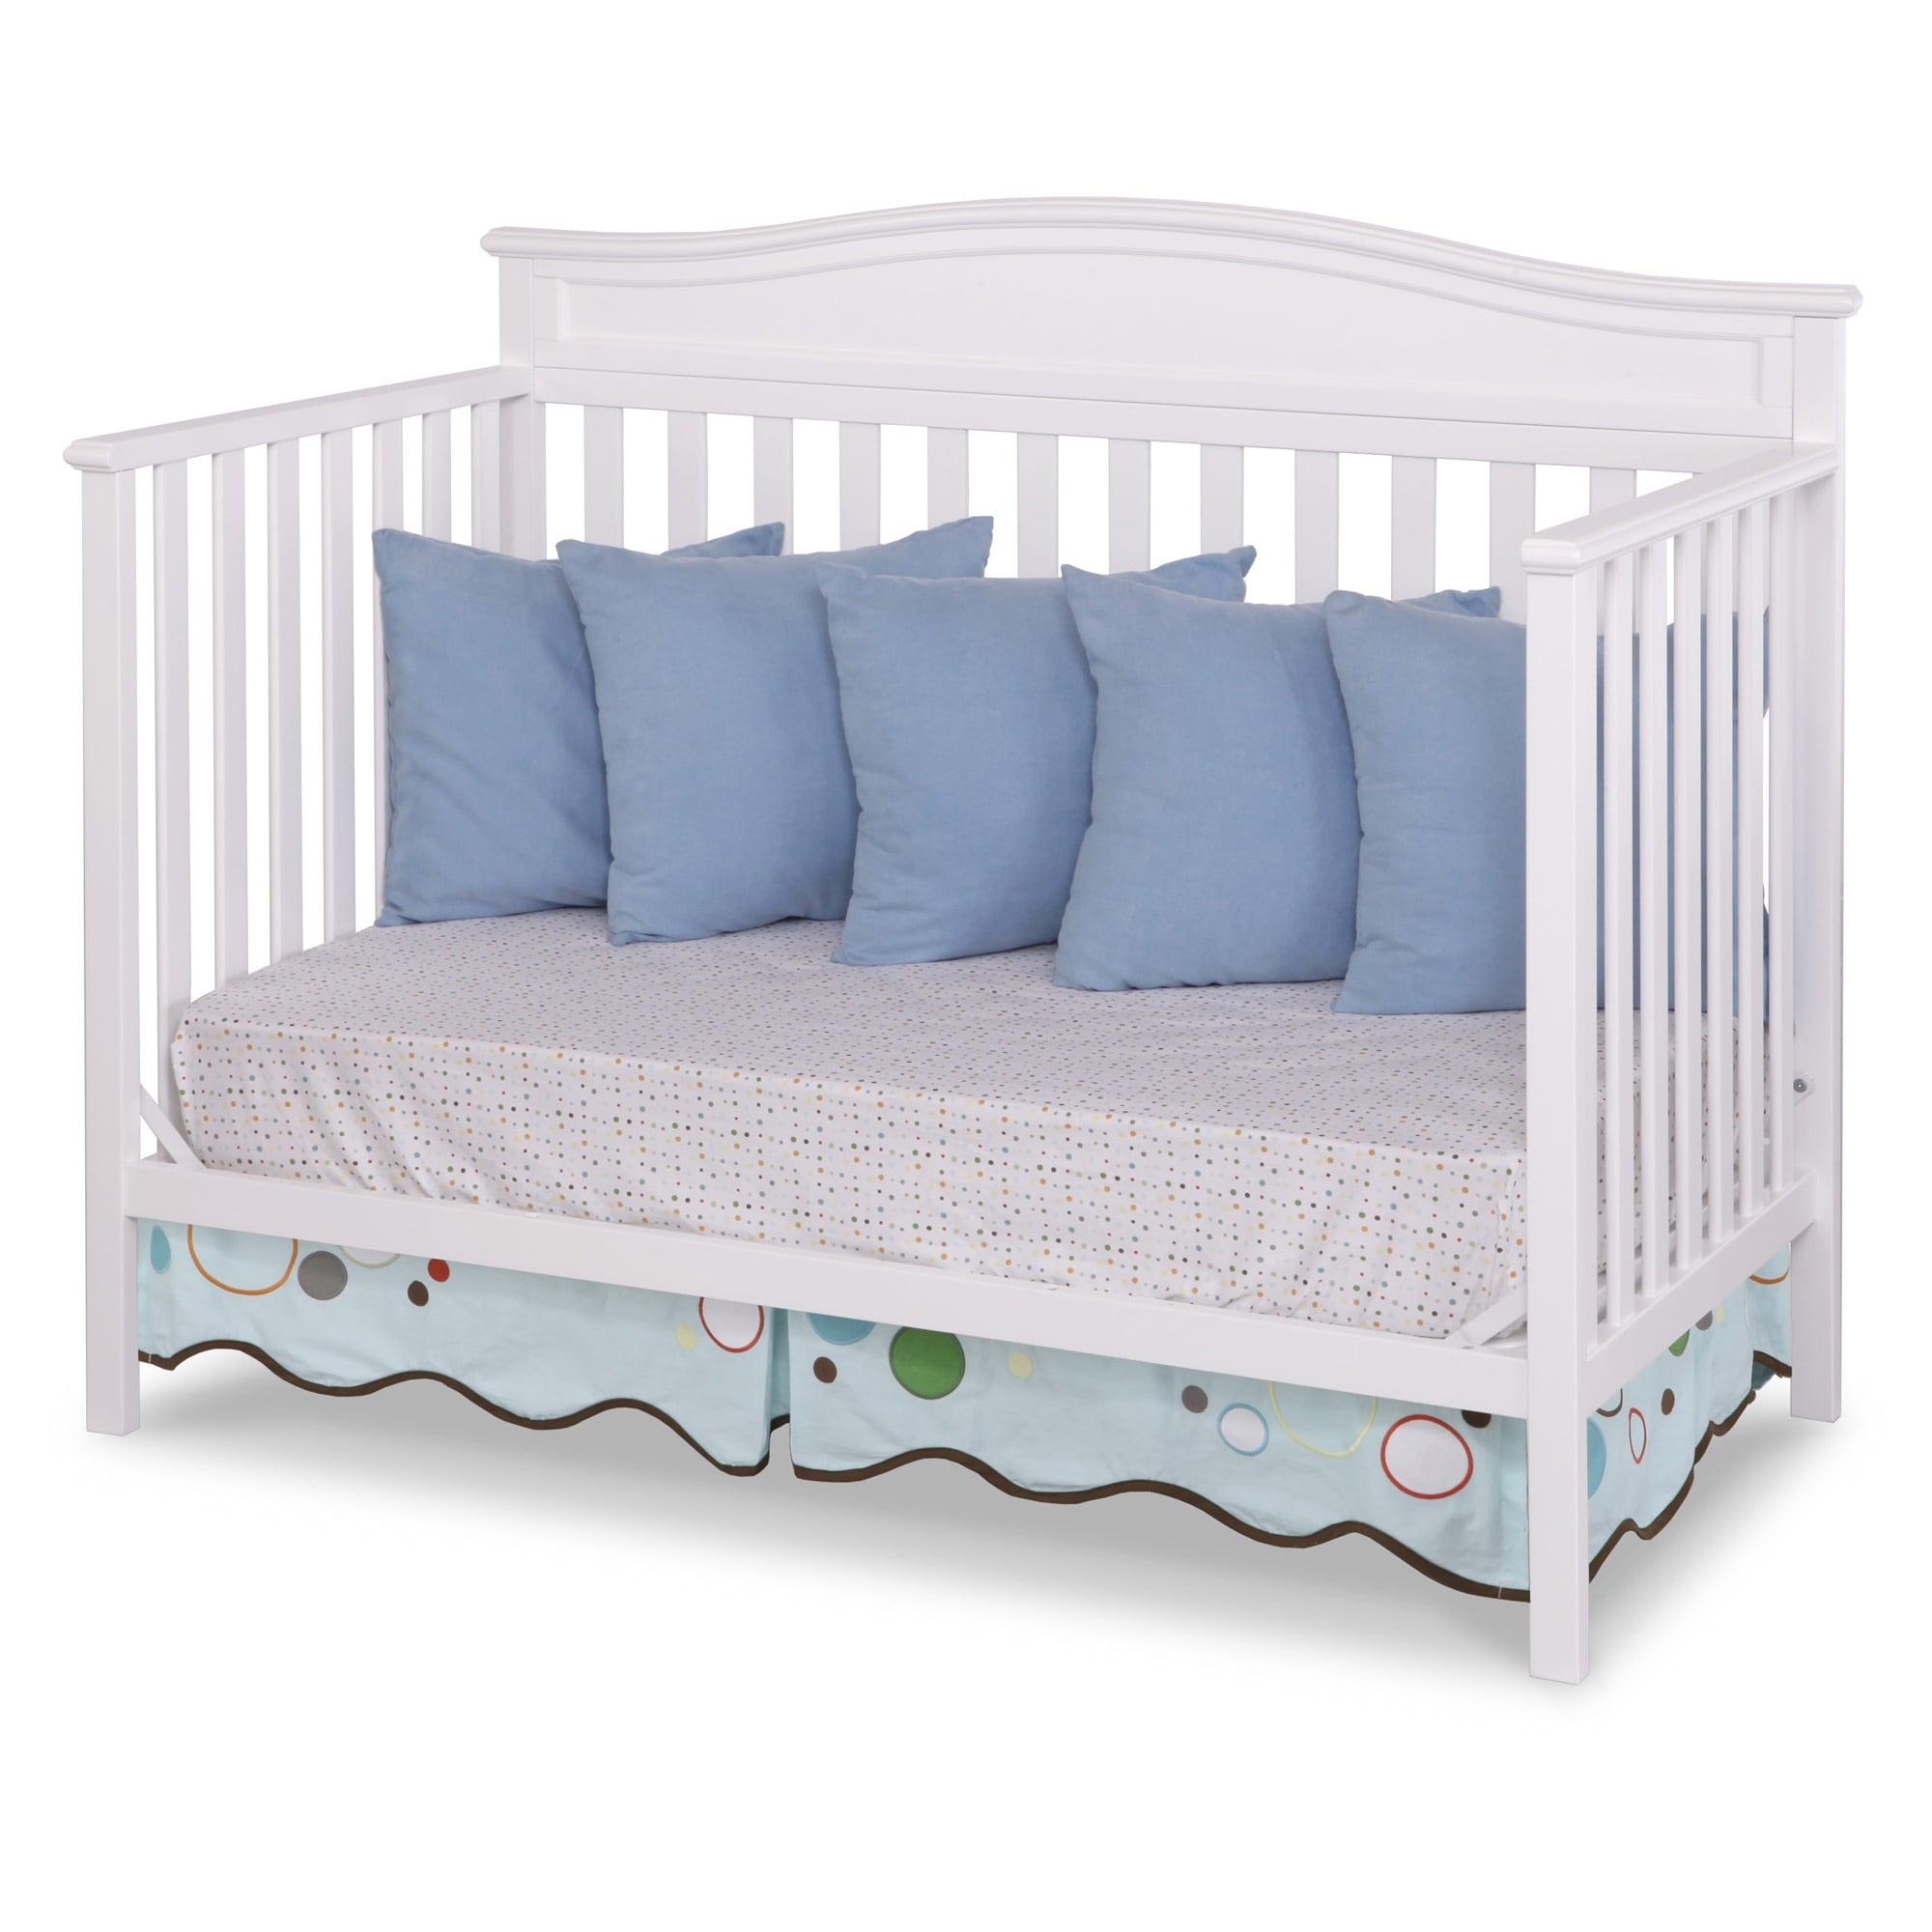 Shop Delta Children Larkin 4-in-1 Crib - Free Shipping Today ...